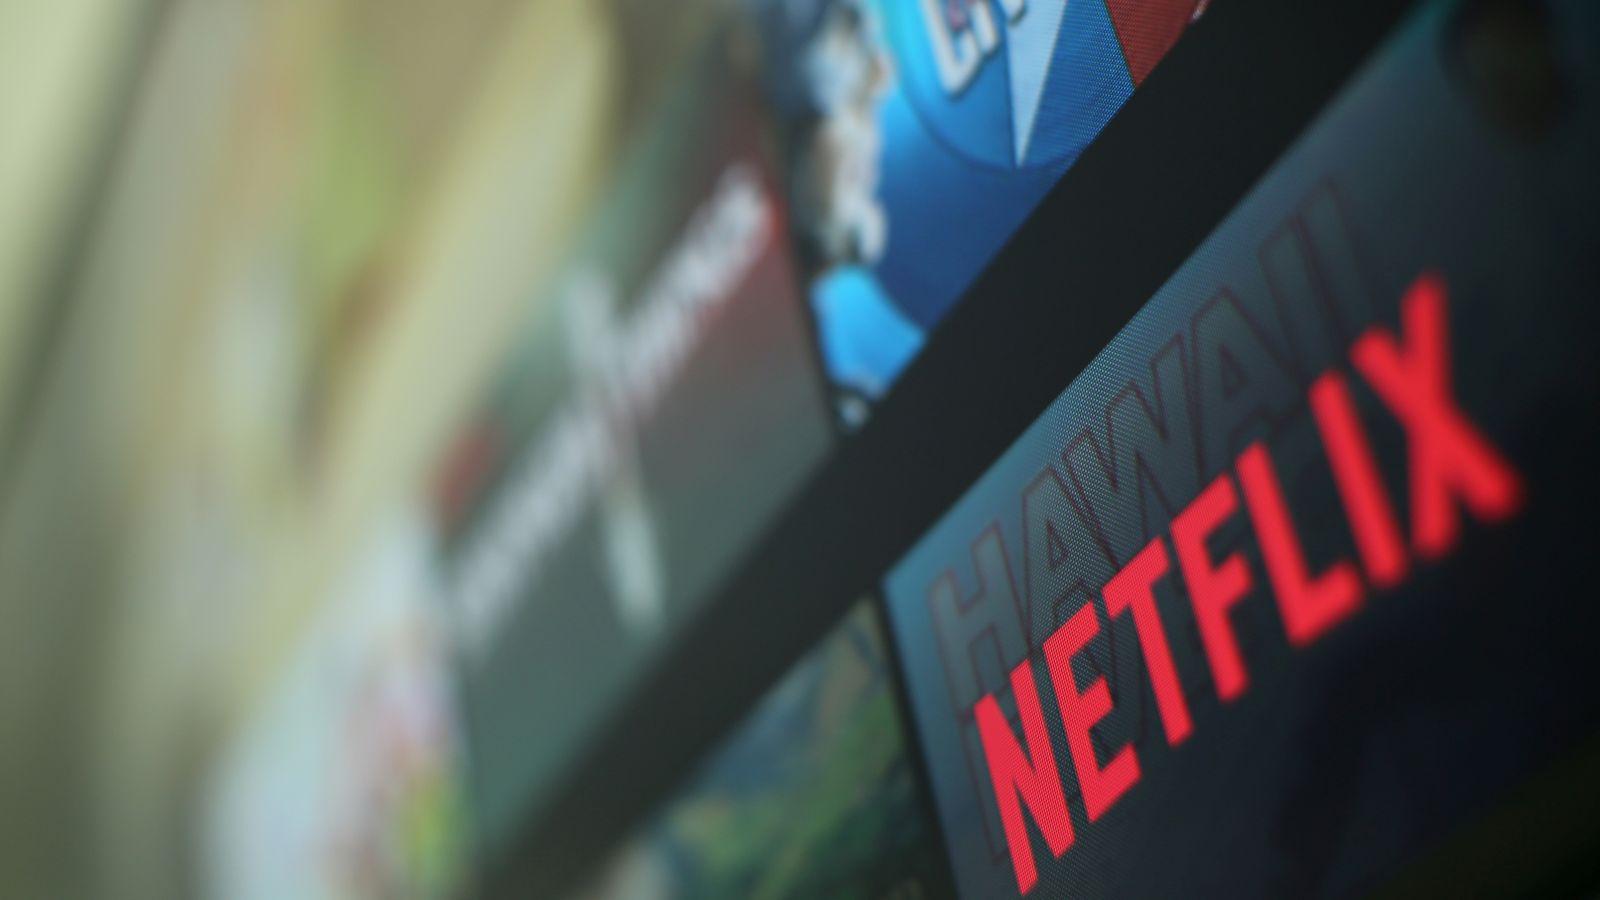 Netflix's top spokesman fired over 'N-word'